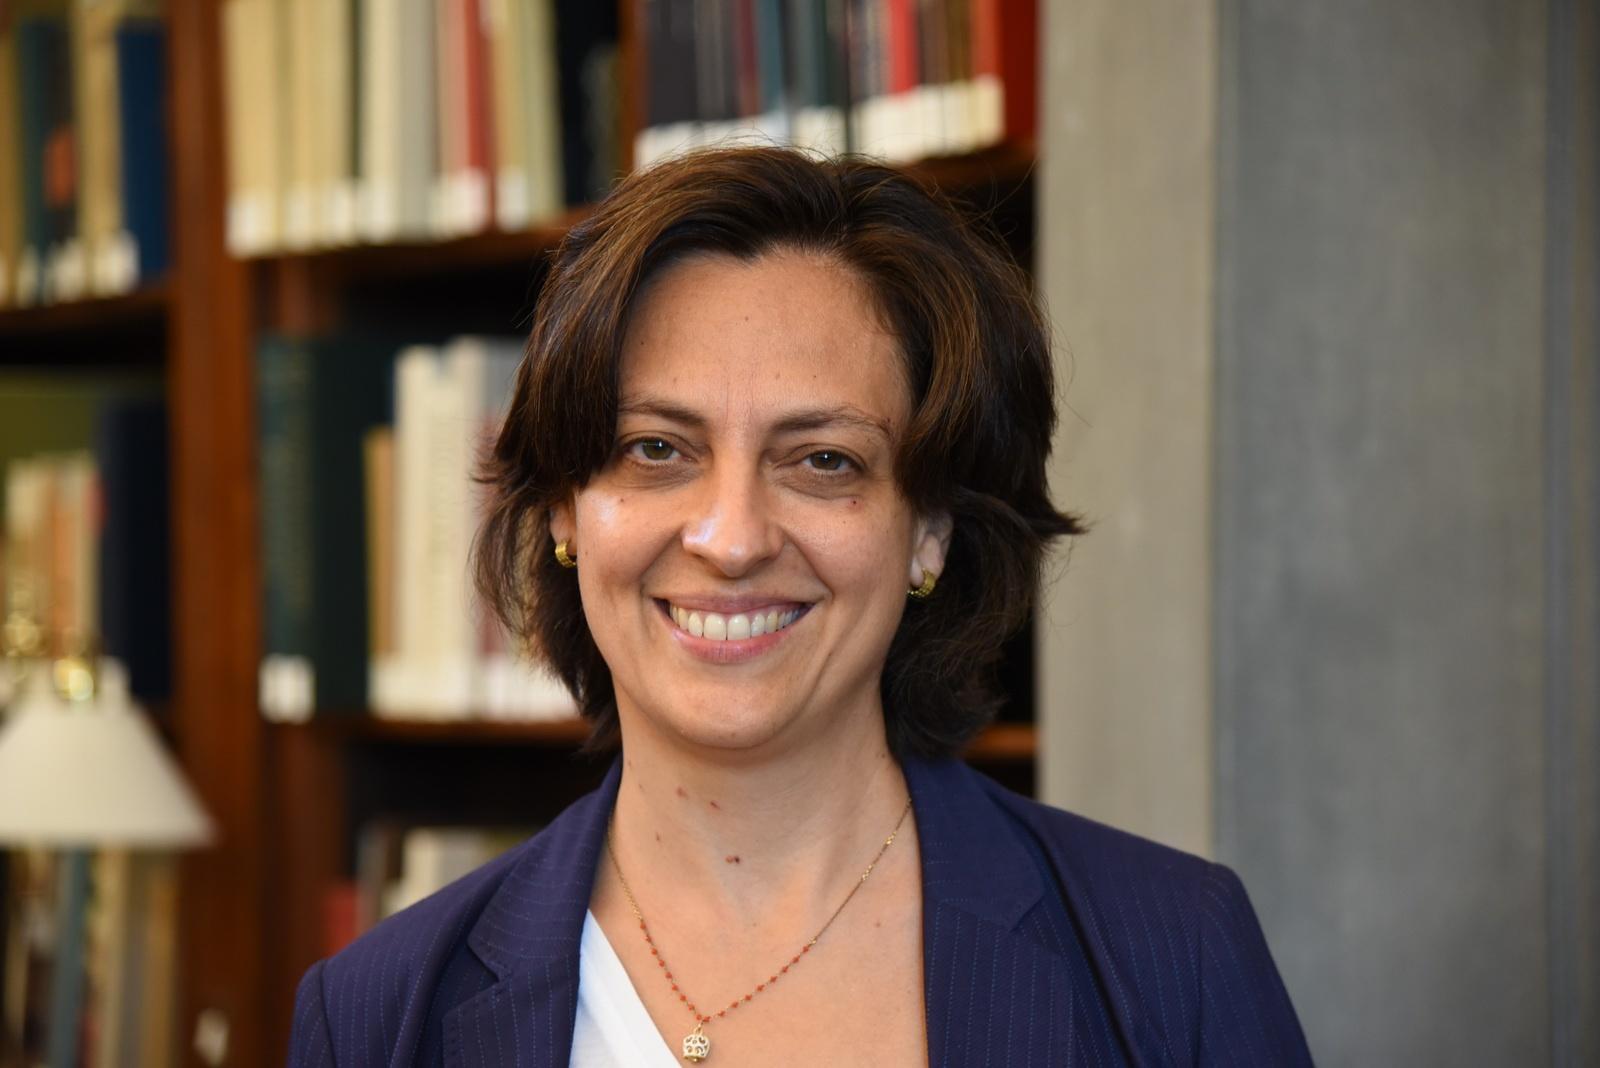 Luciane Beduschi